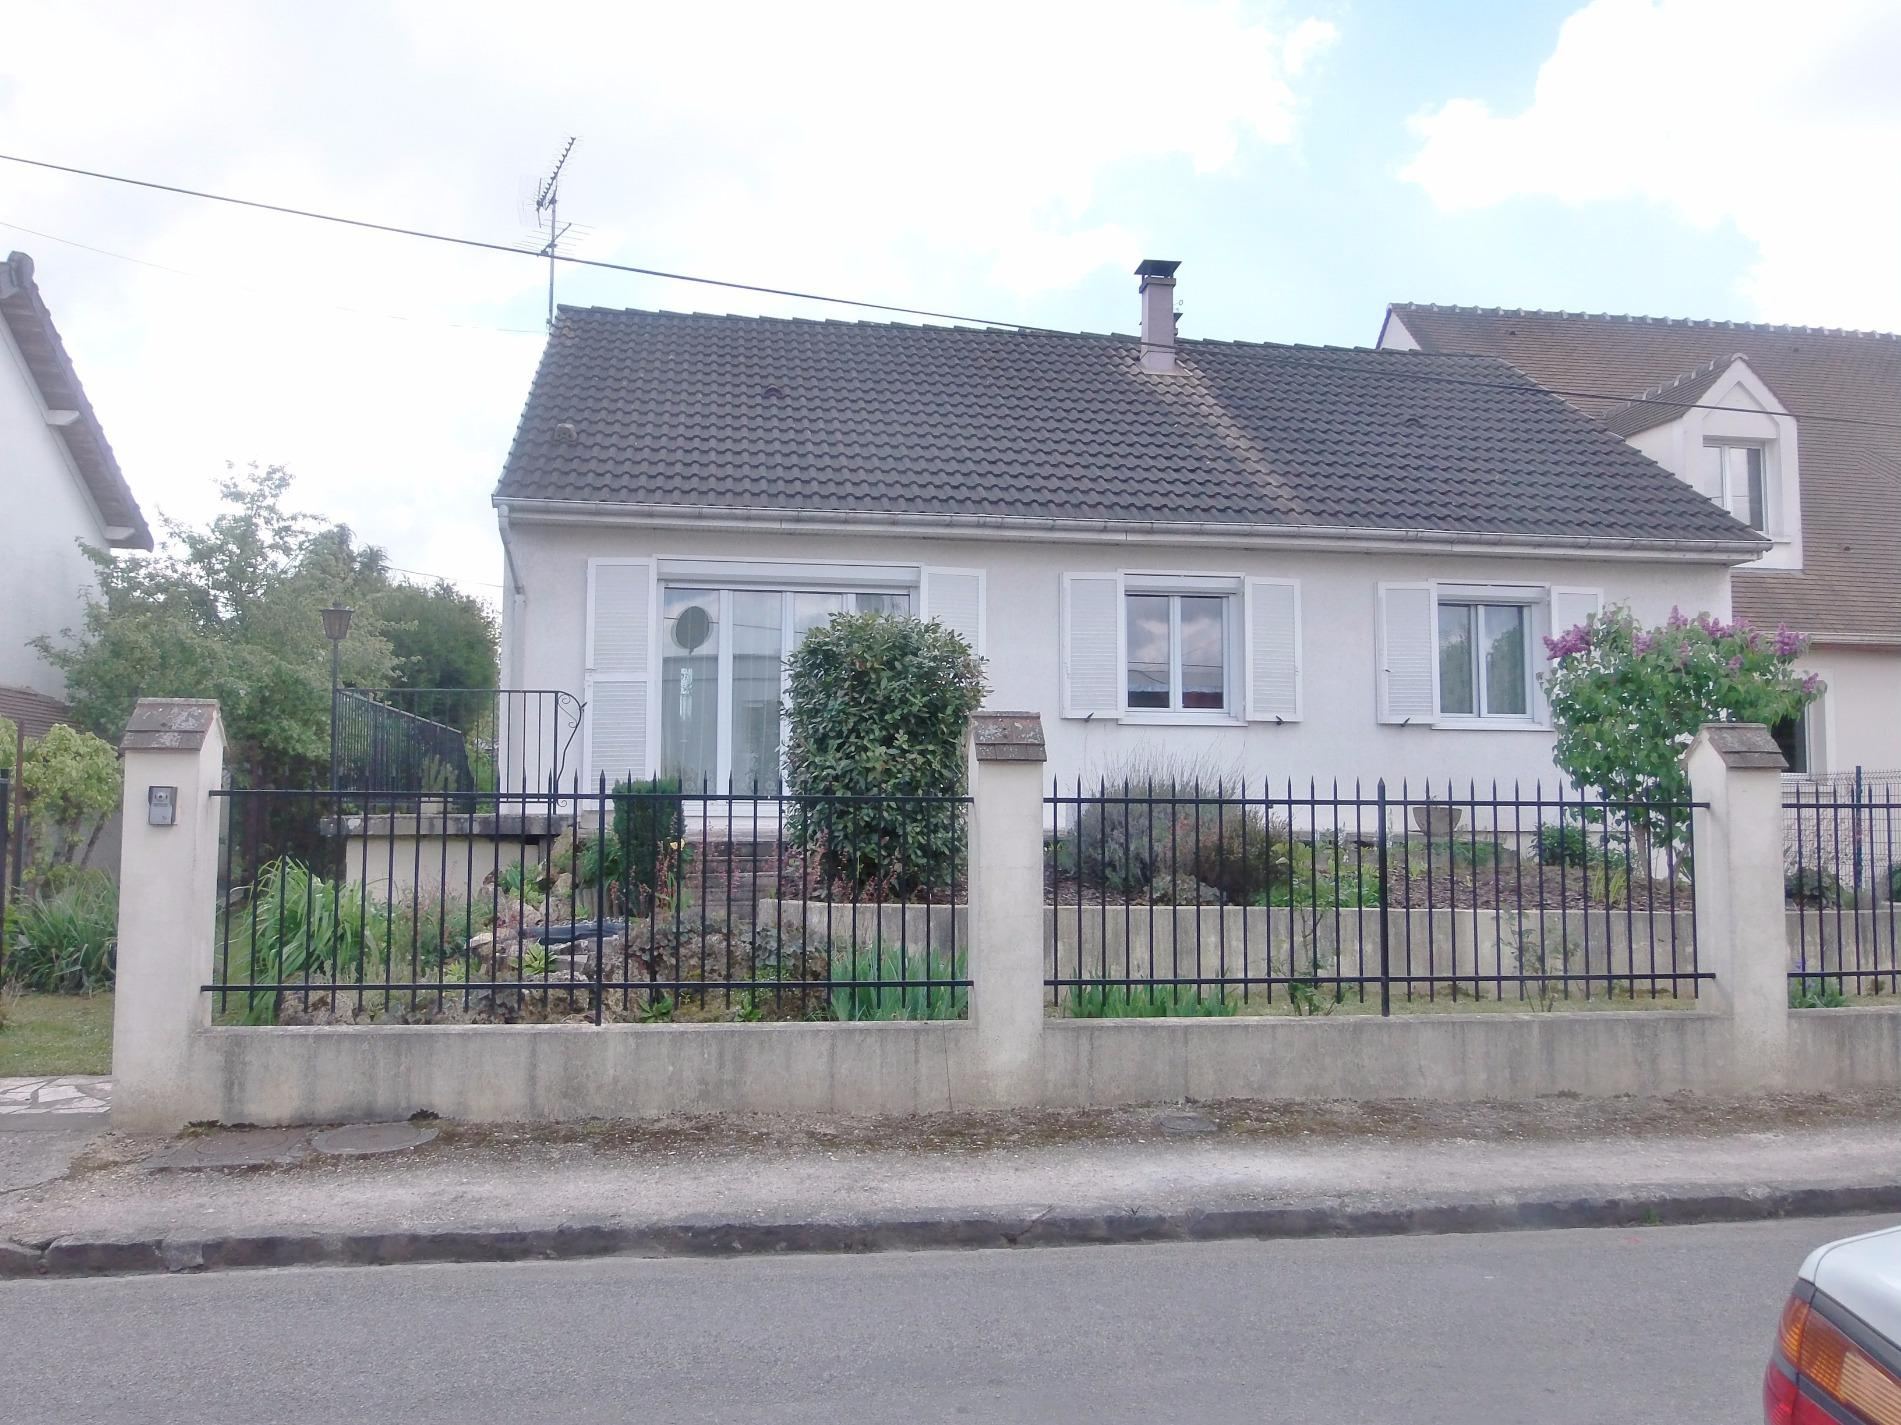 Vente maison de plain pied for Code postal villecresnes